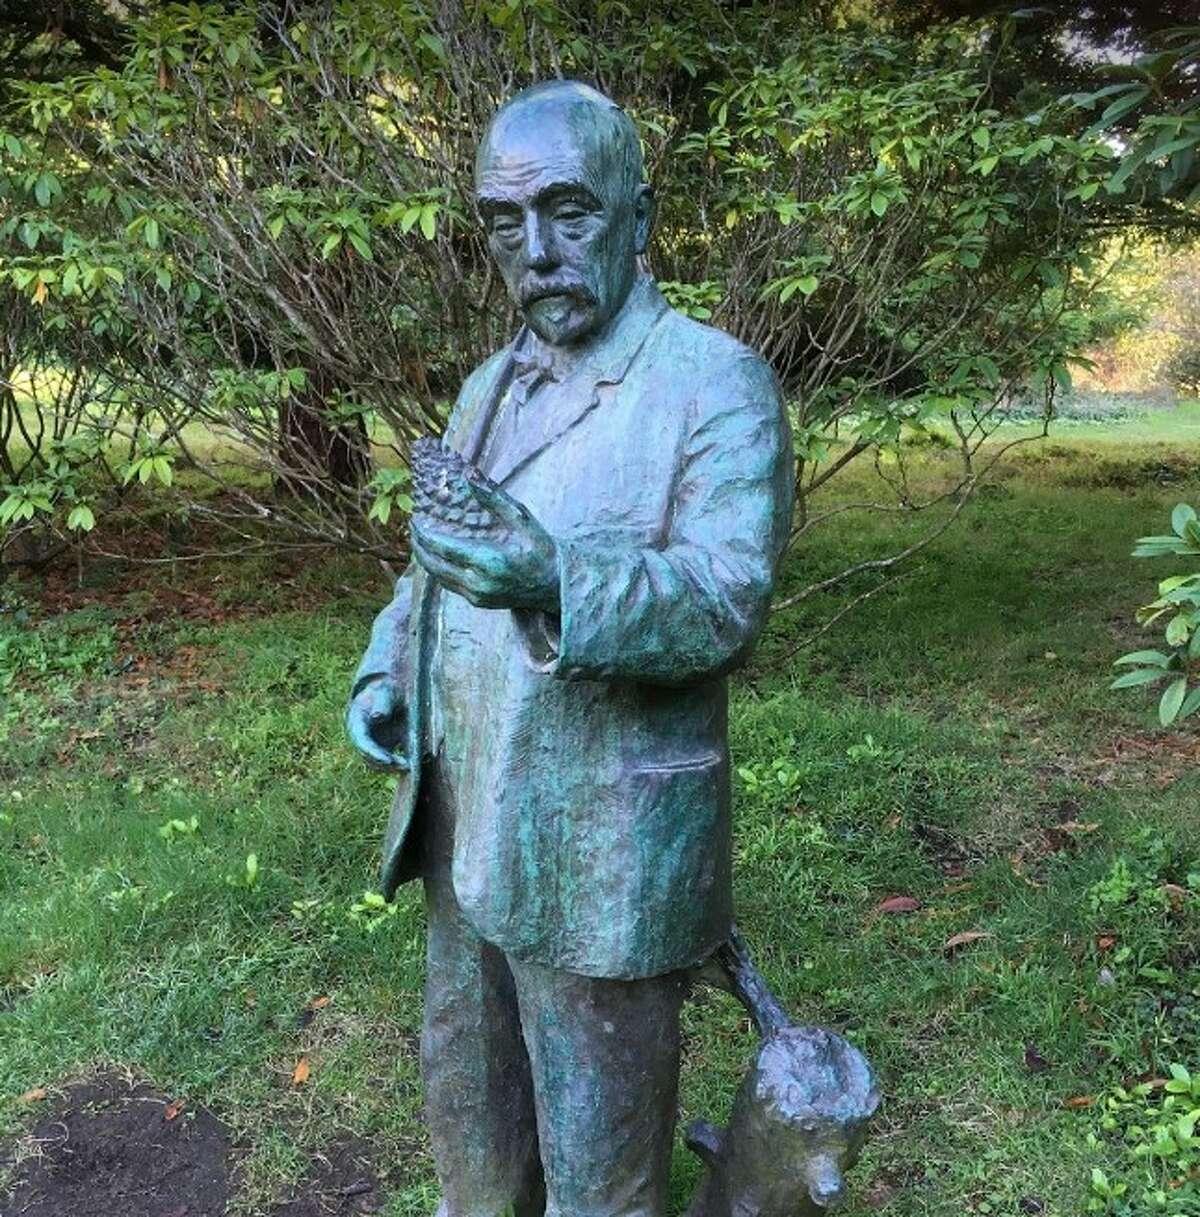 Statue of John McLaren in Golden Gate Park.